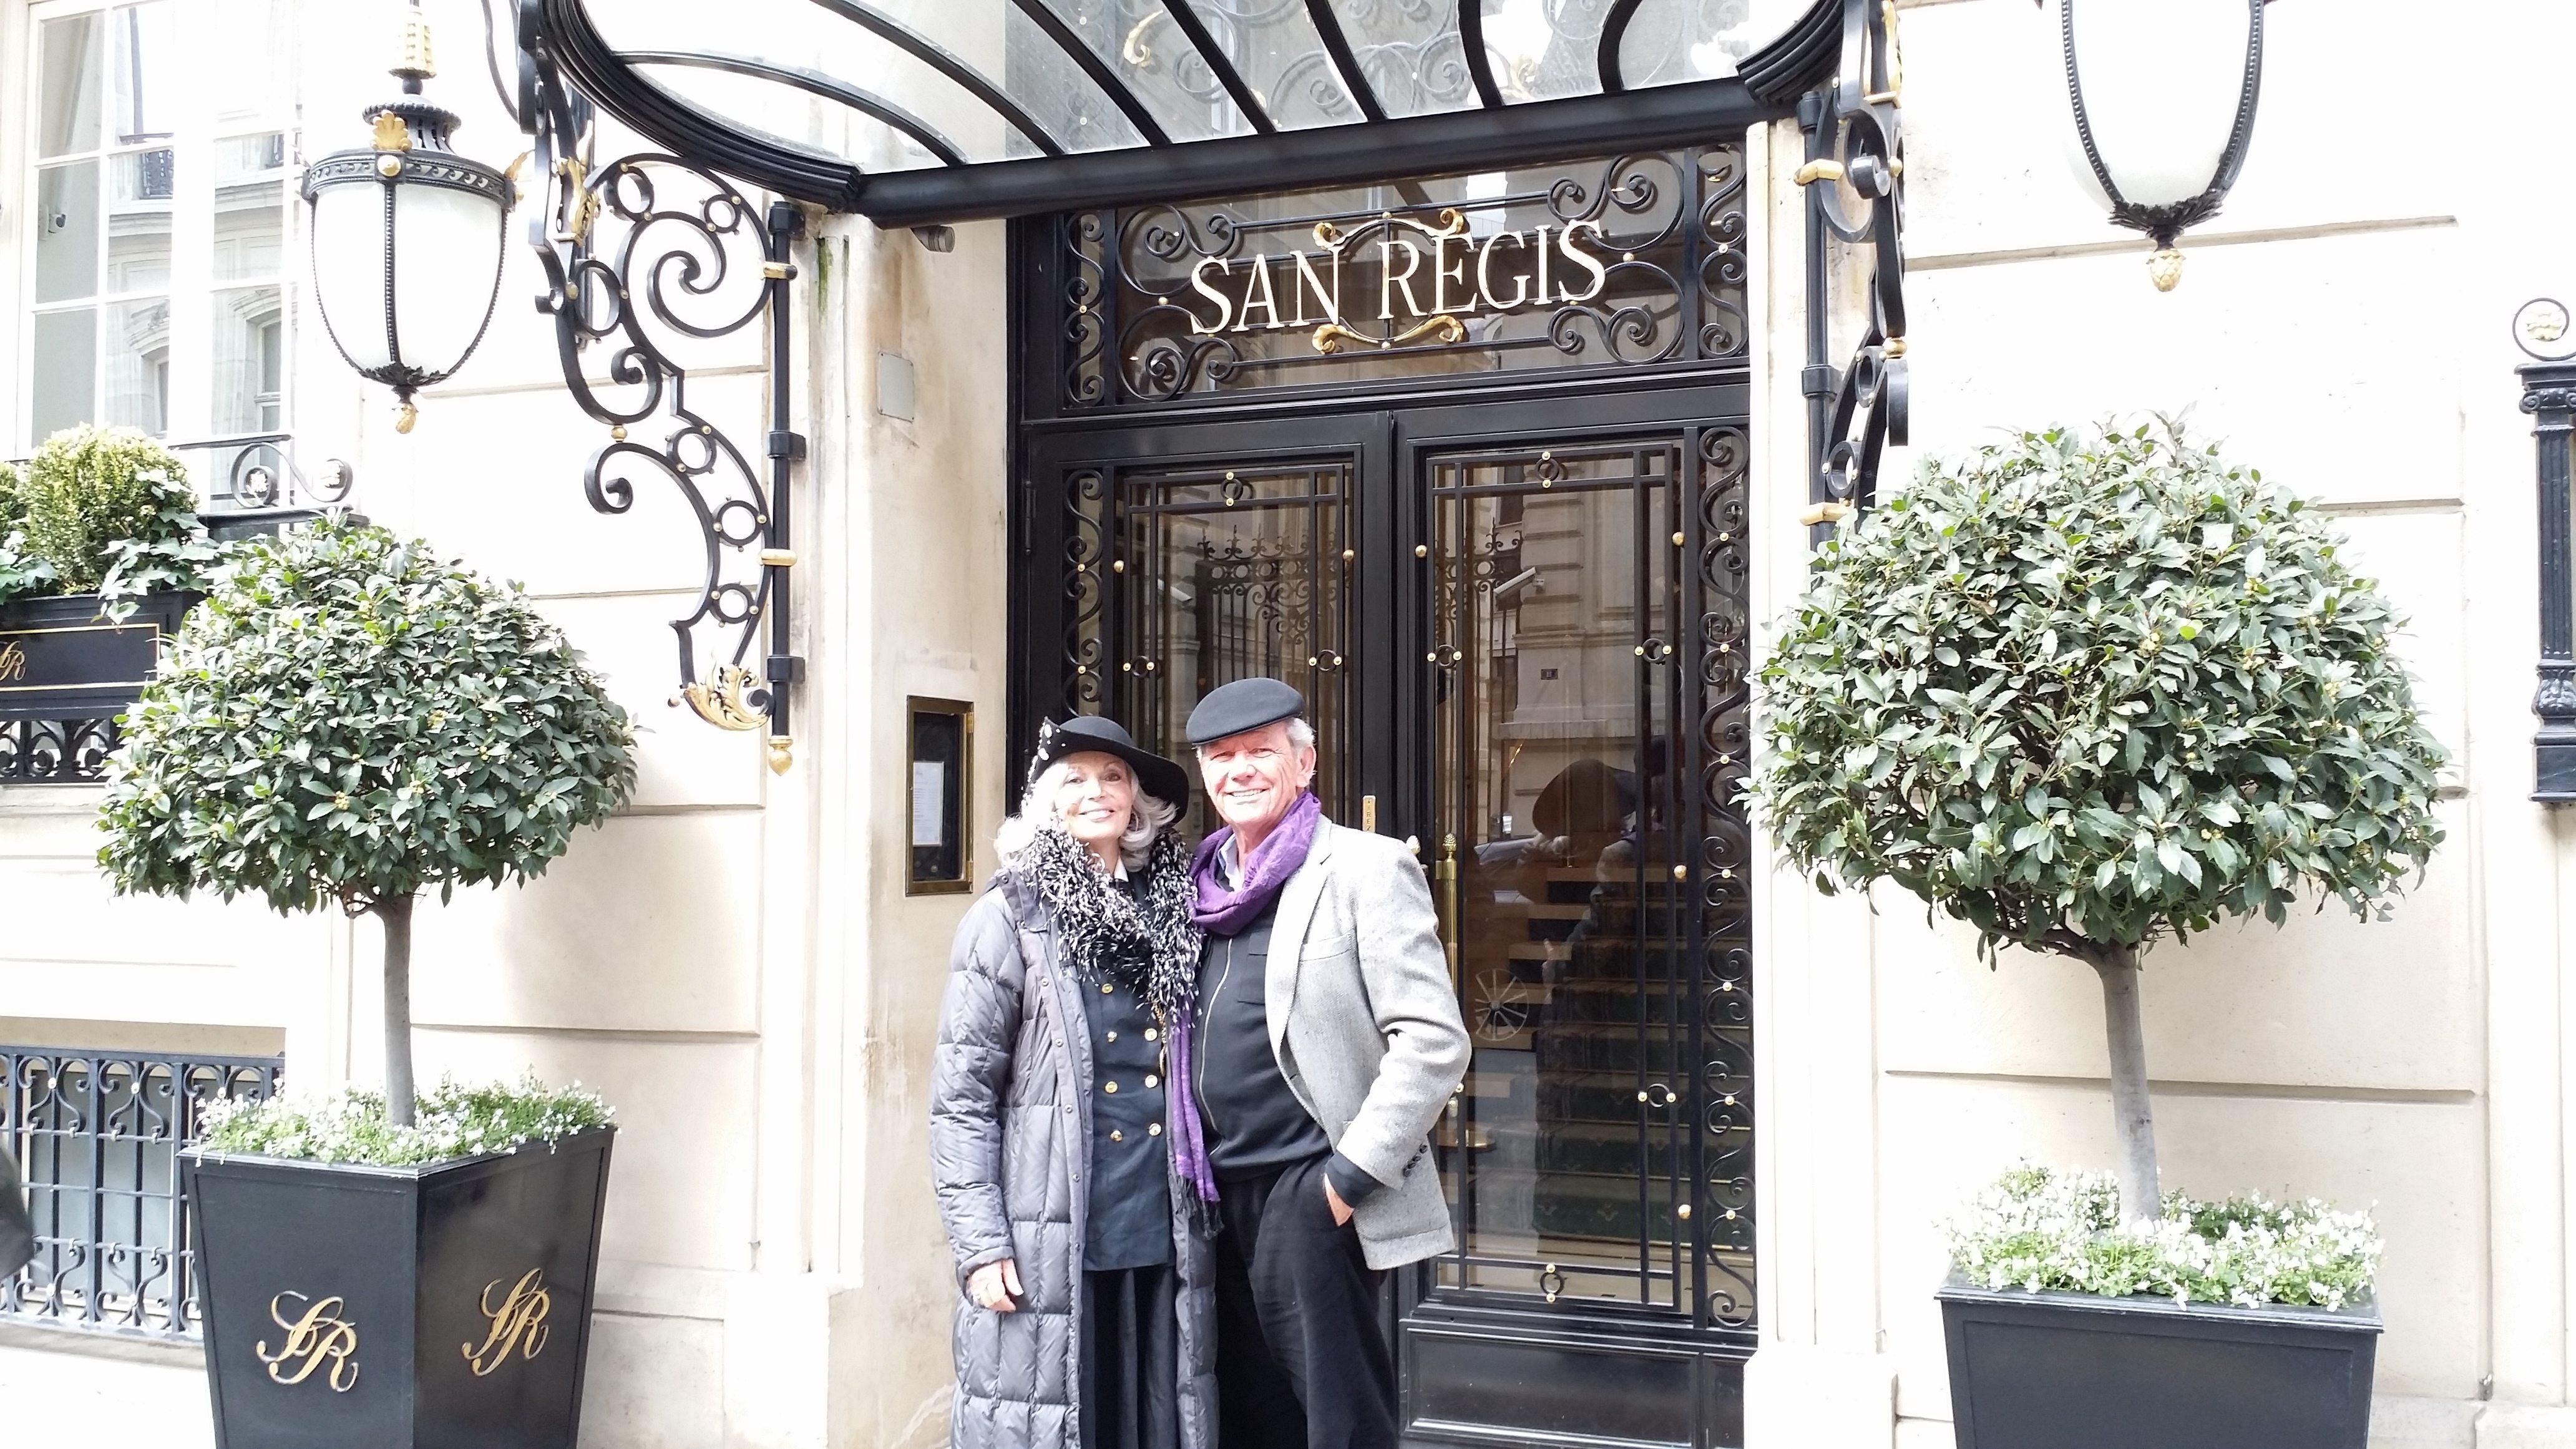 The hotel san r gis paris france luxecoliving 39 s best for San regis